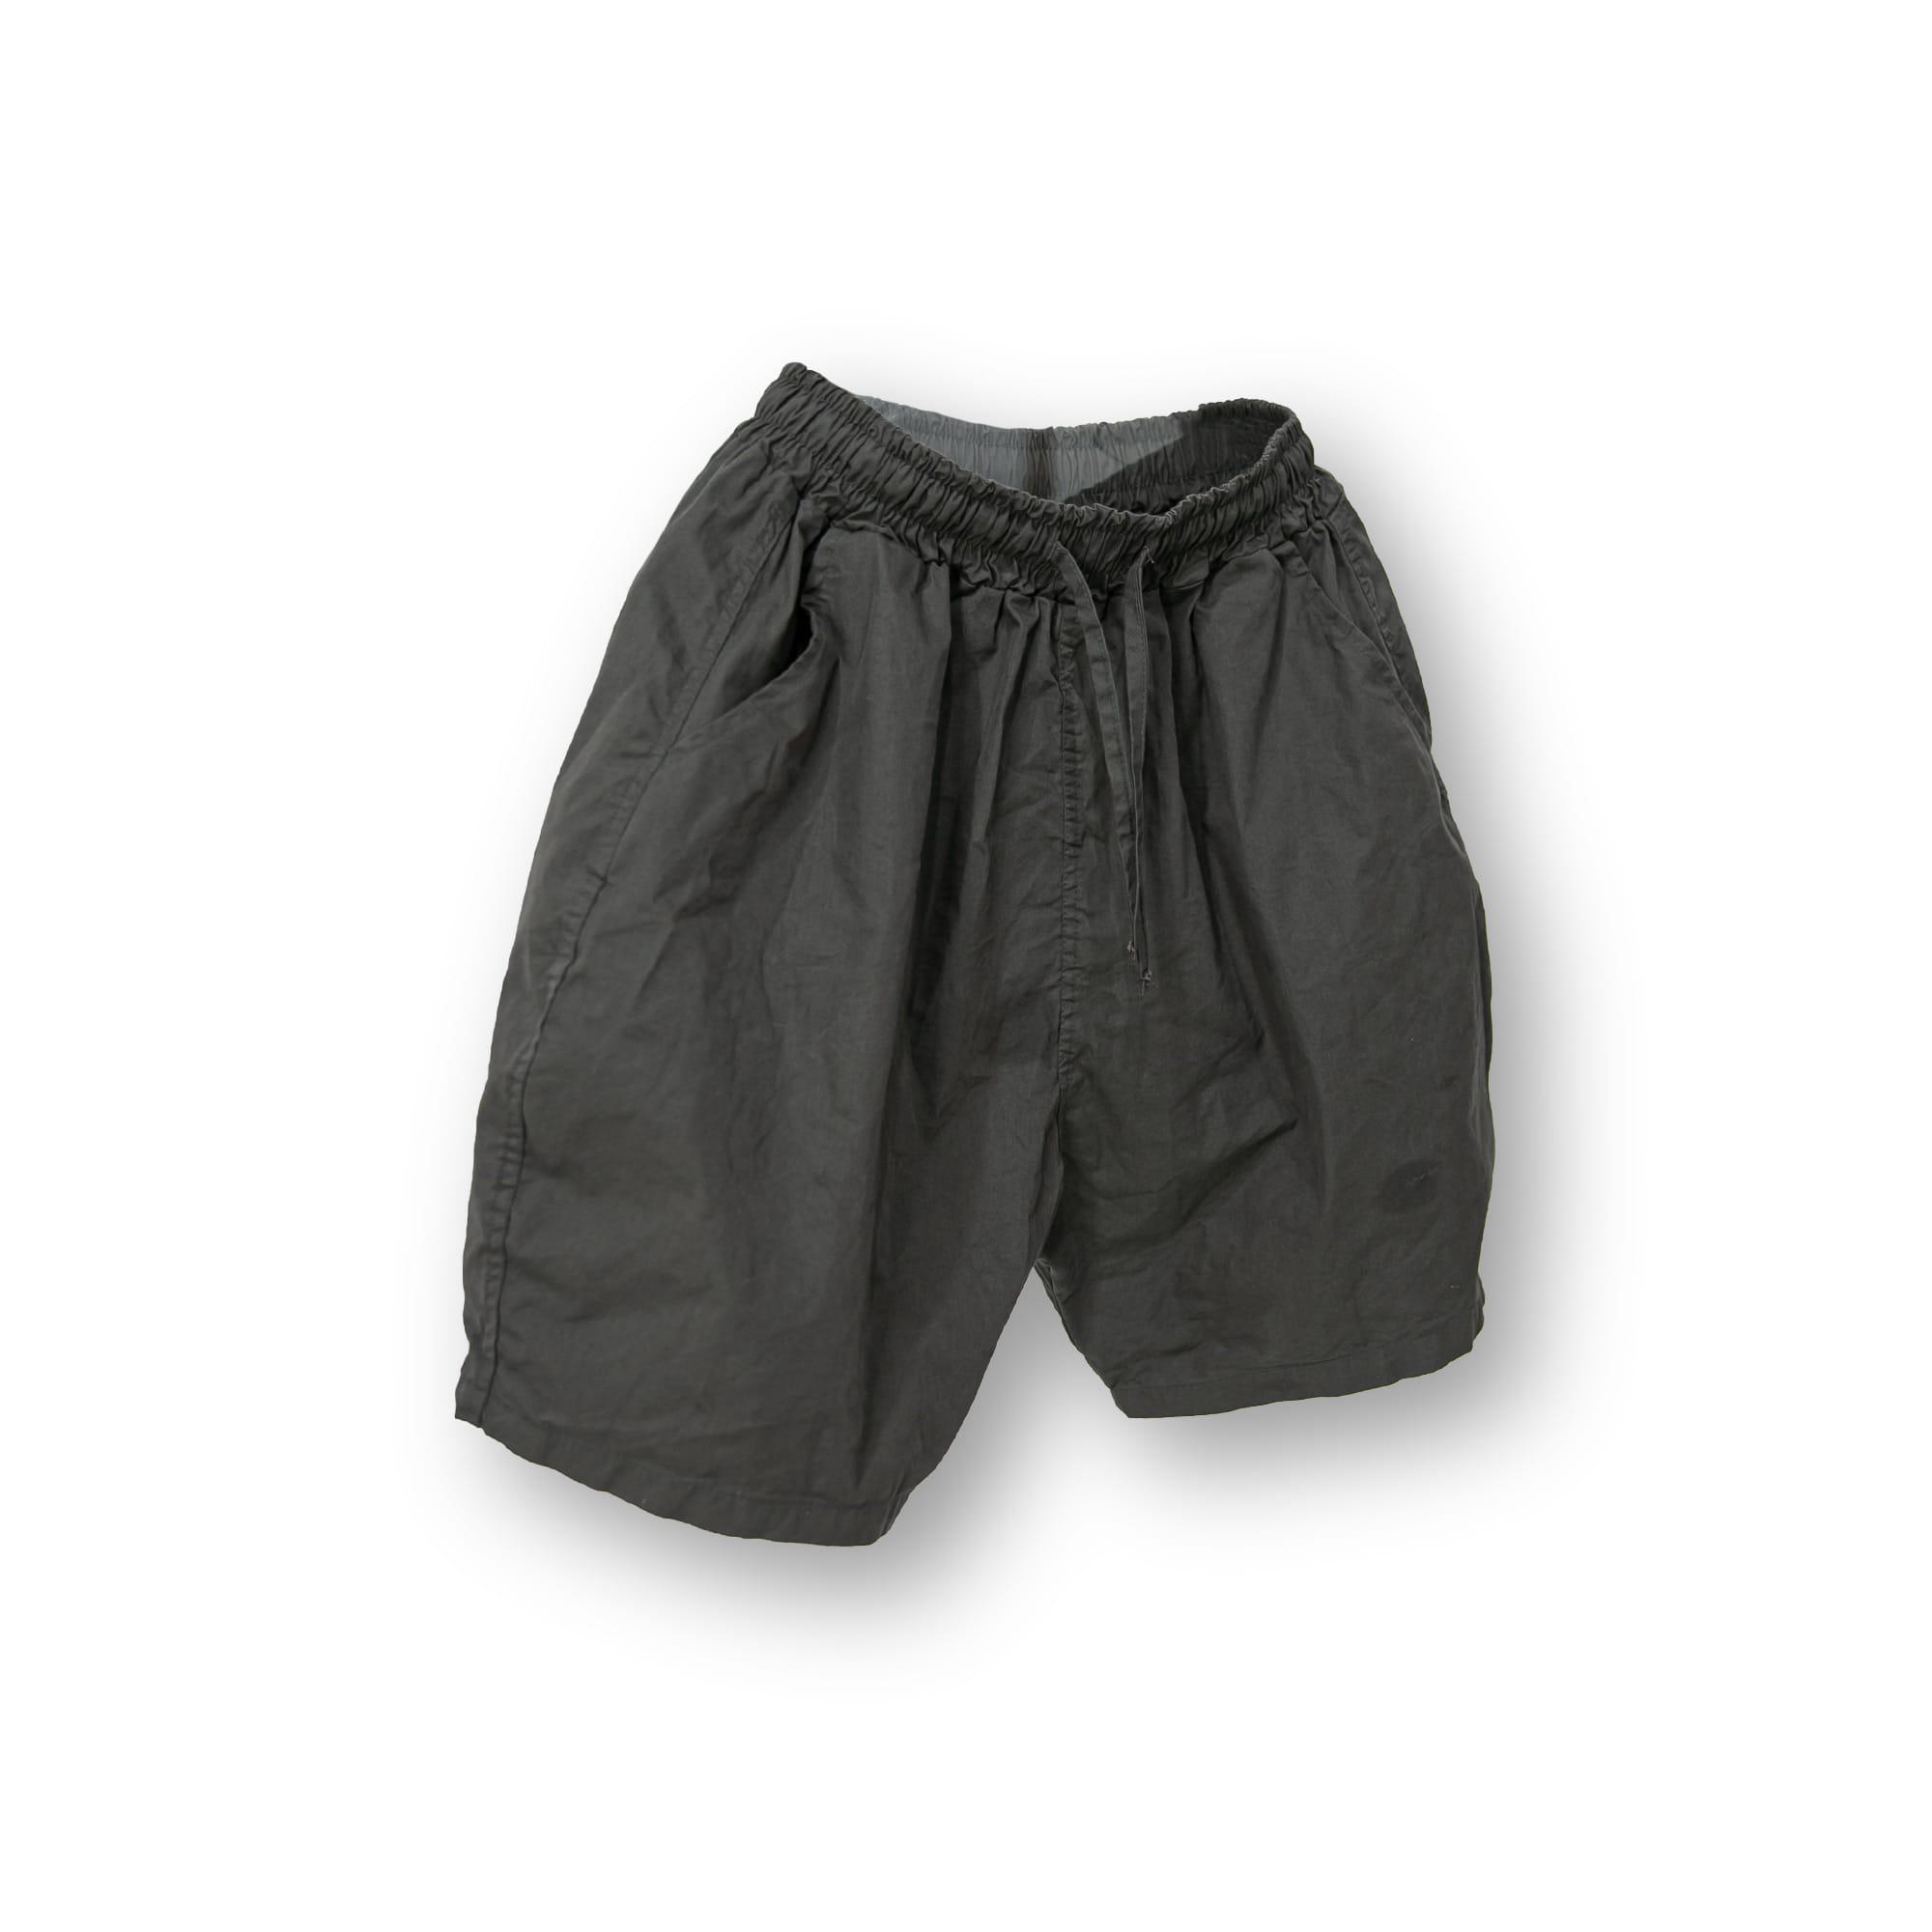 Cn Volume Shorts - Dark Grey